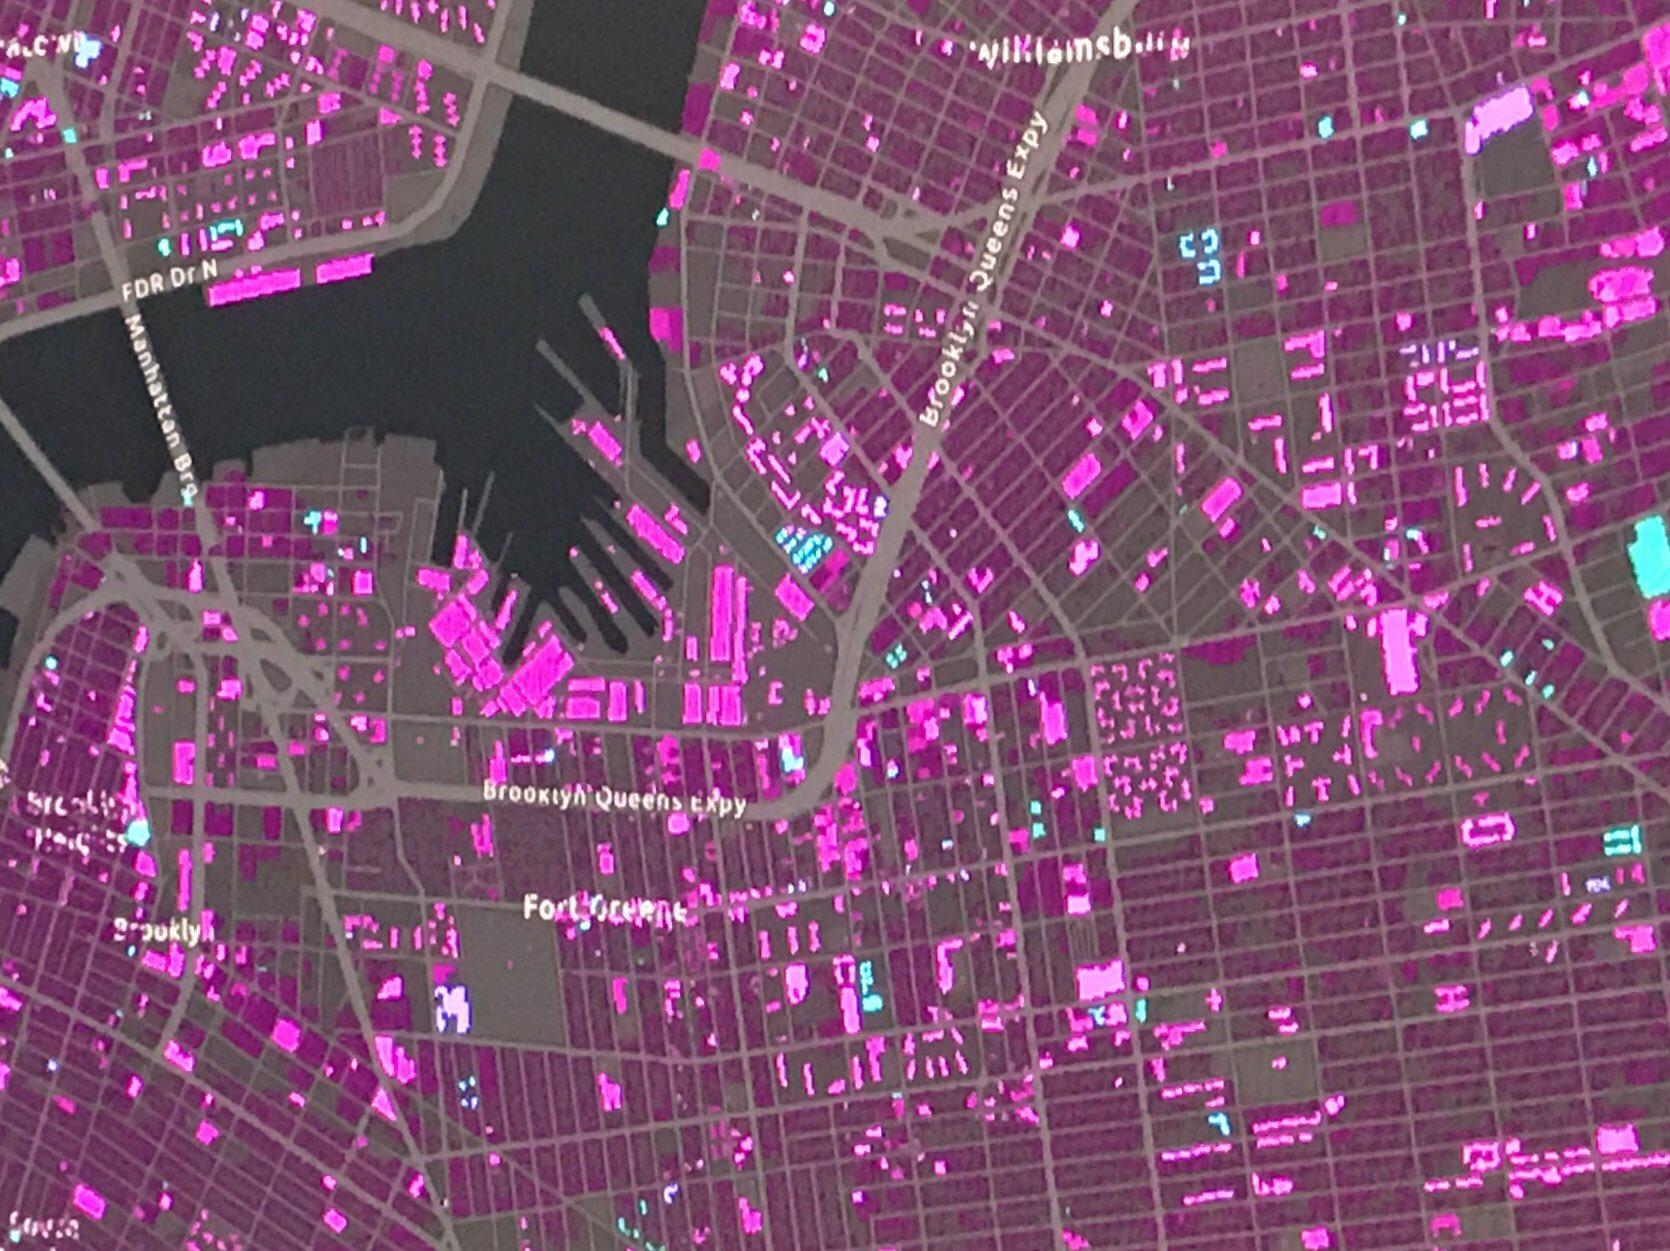 Waze mapping